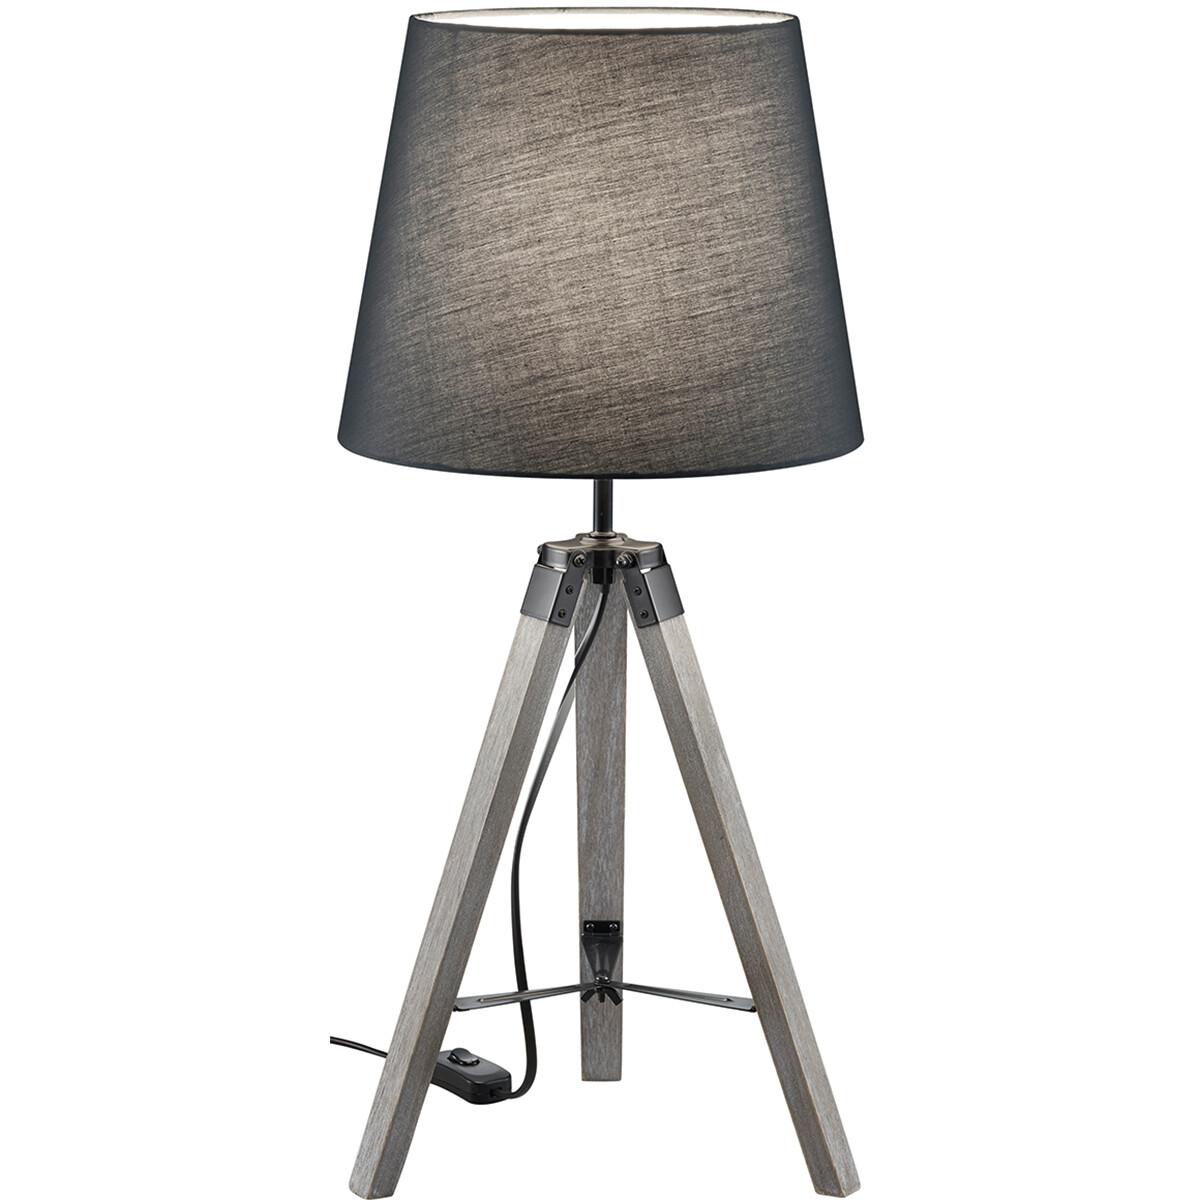 LED Tafellamp - Tafelverlichting - Trion Tripady - E27 Fitting - Rond - Mat Grijs - Hout